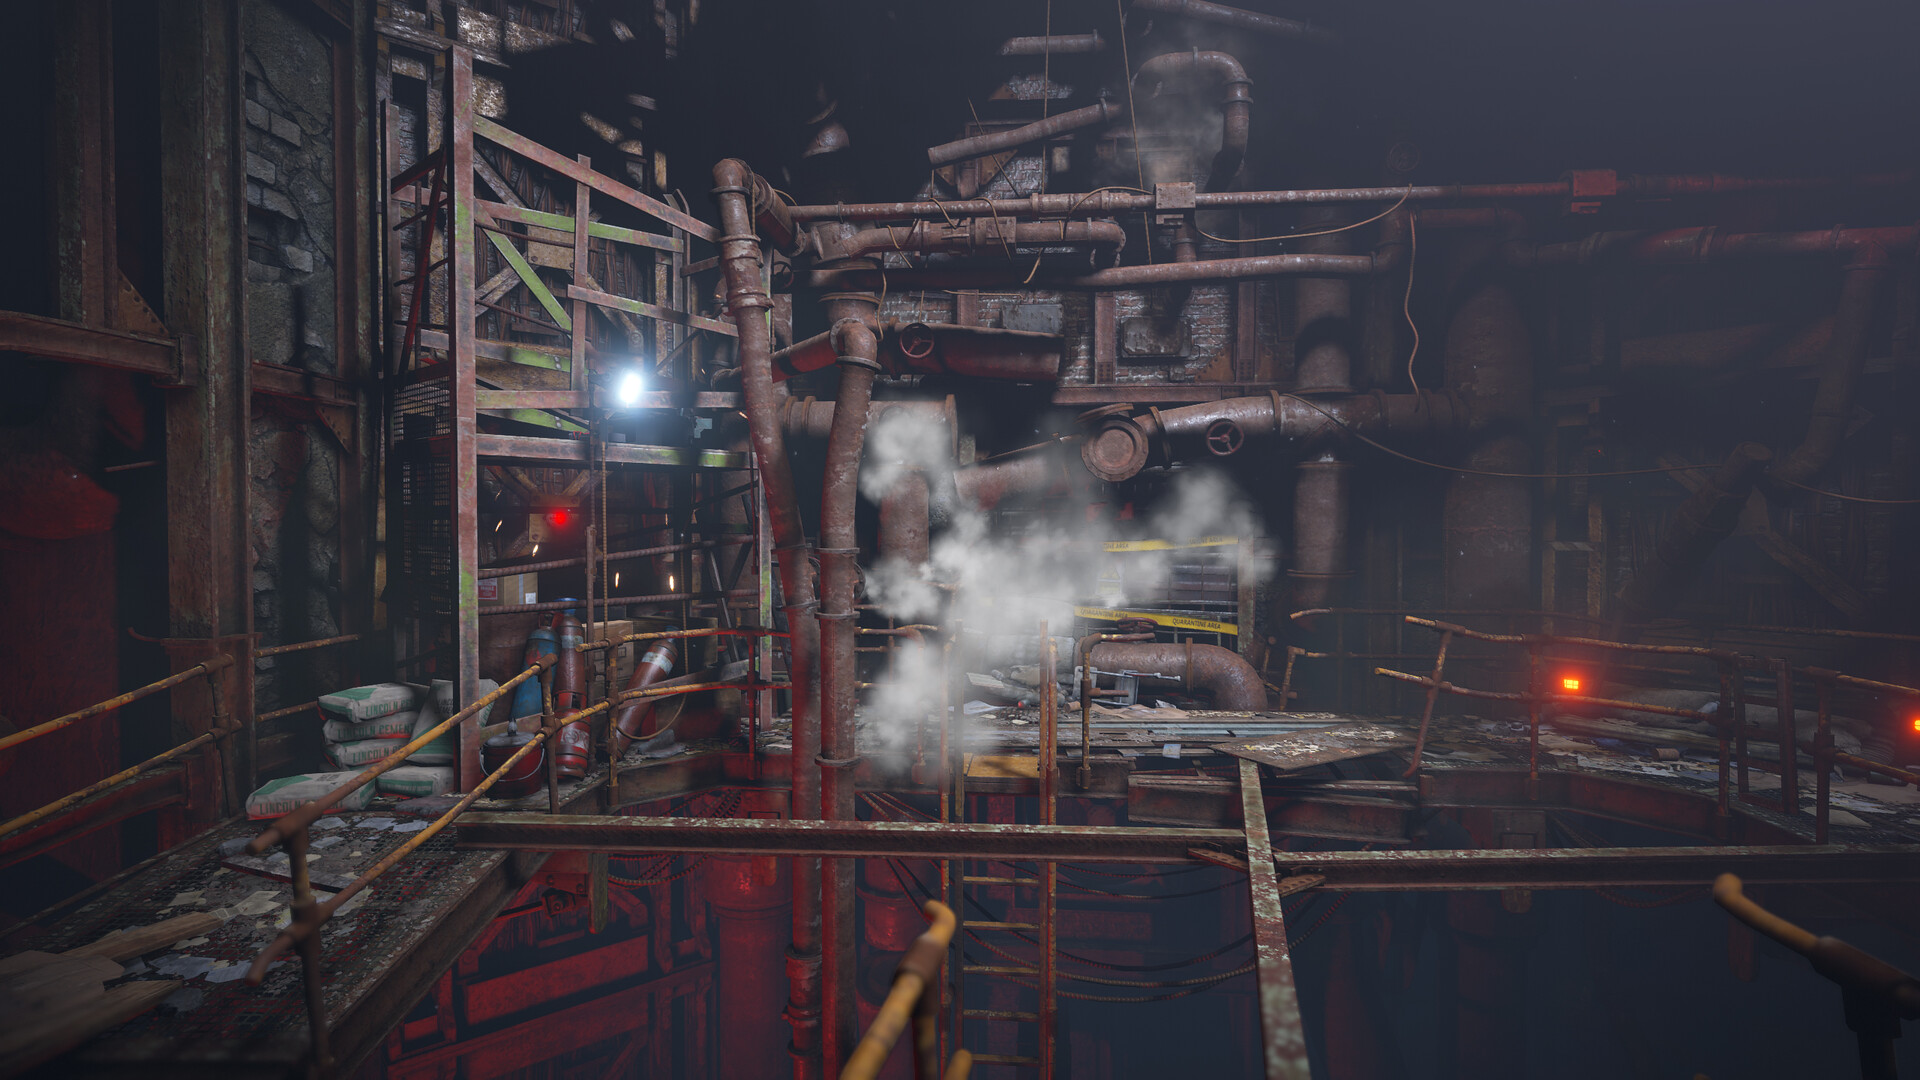 Andrew averkin utopiasyndrome boiler a2 11